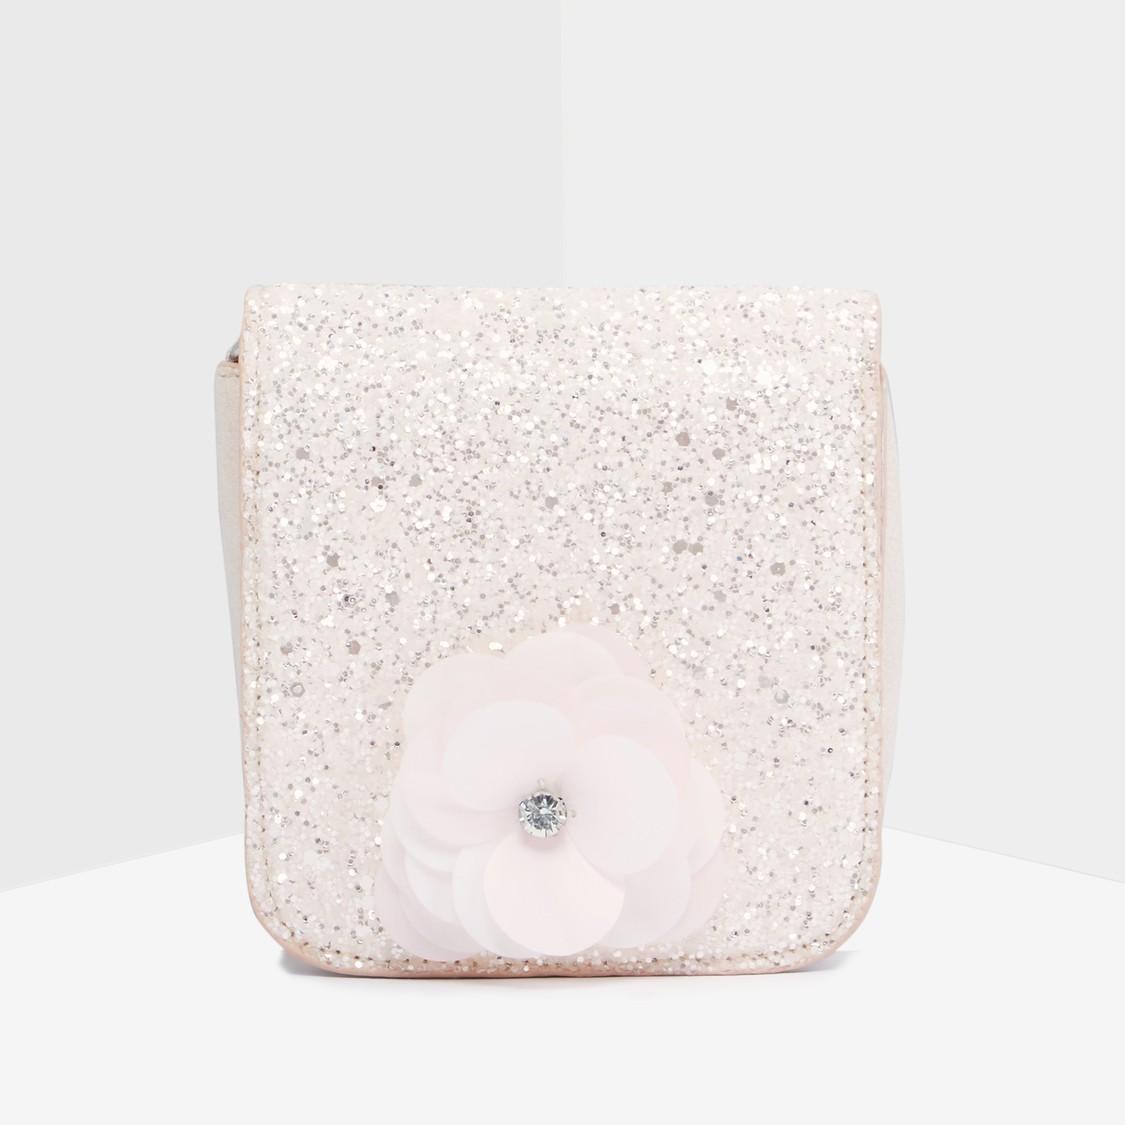 Glitter Satchel Bag with Flower Applique Detail